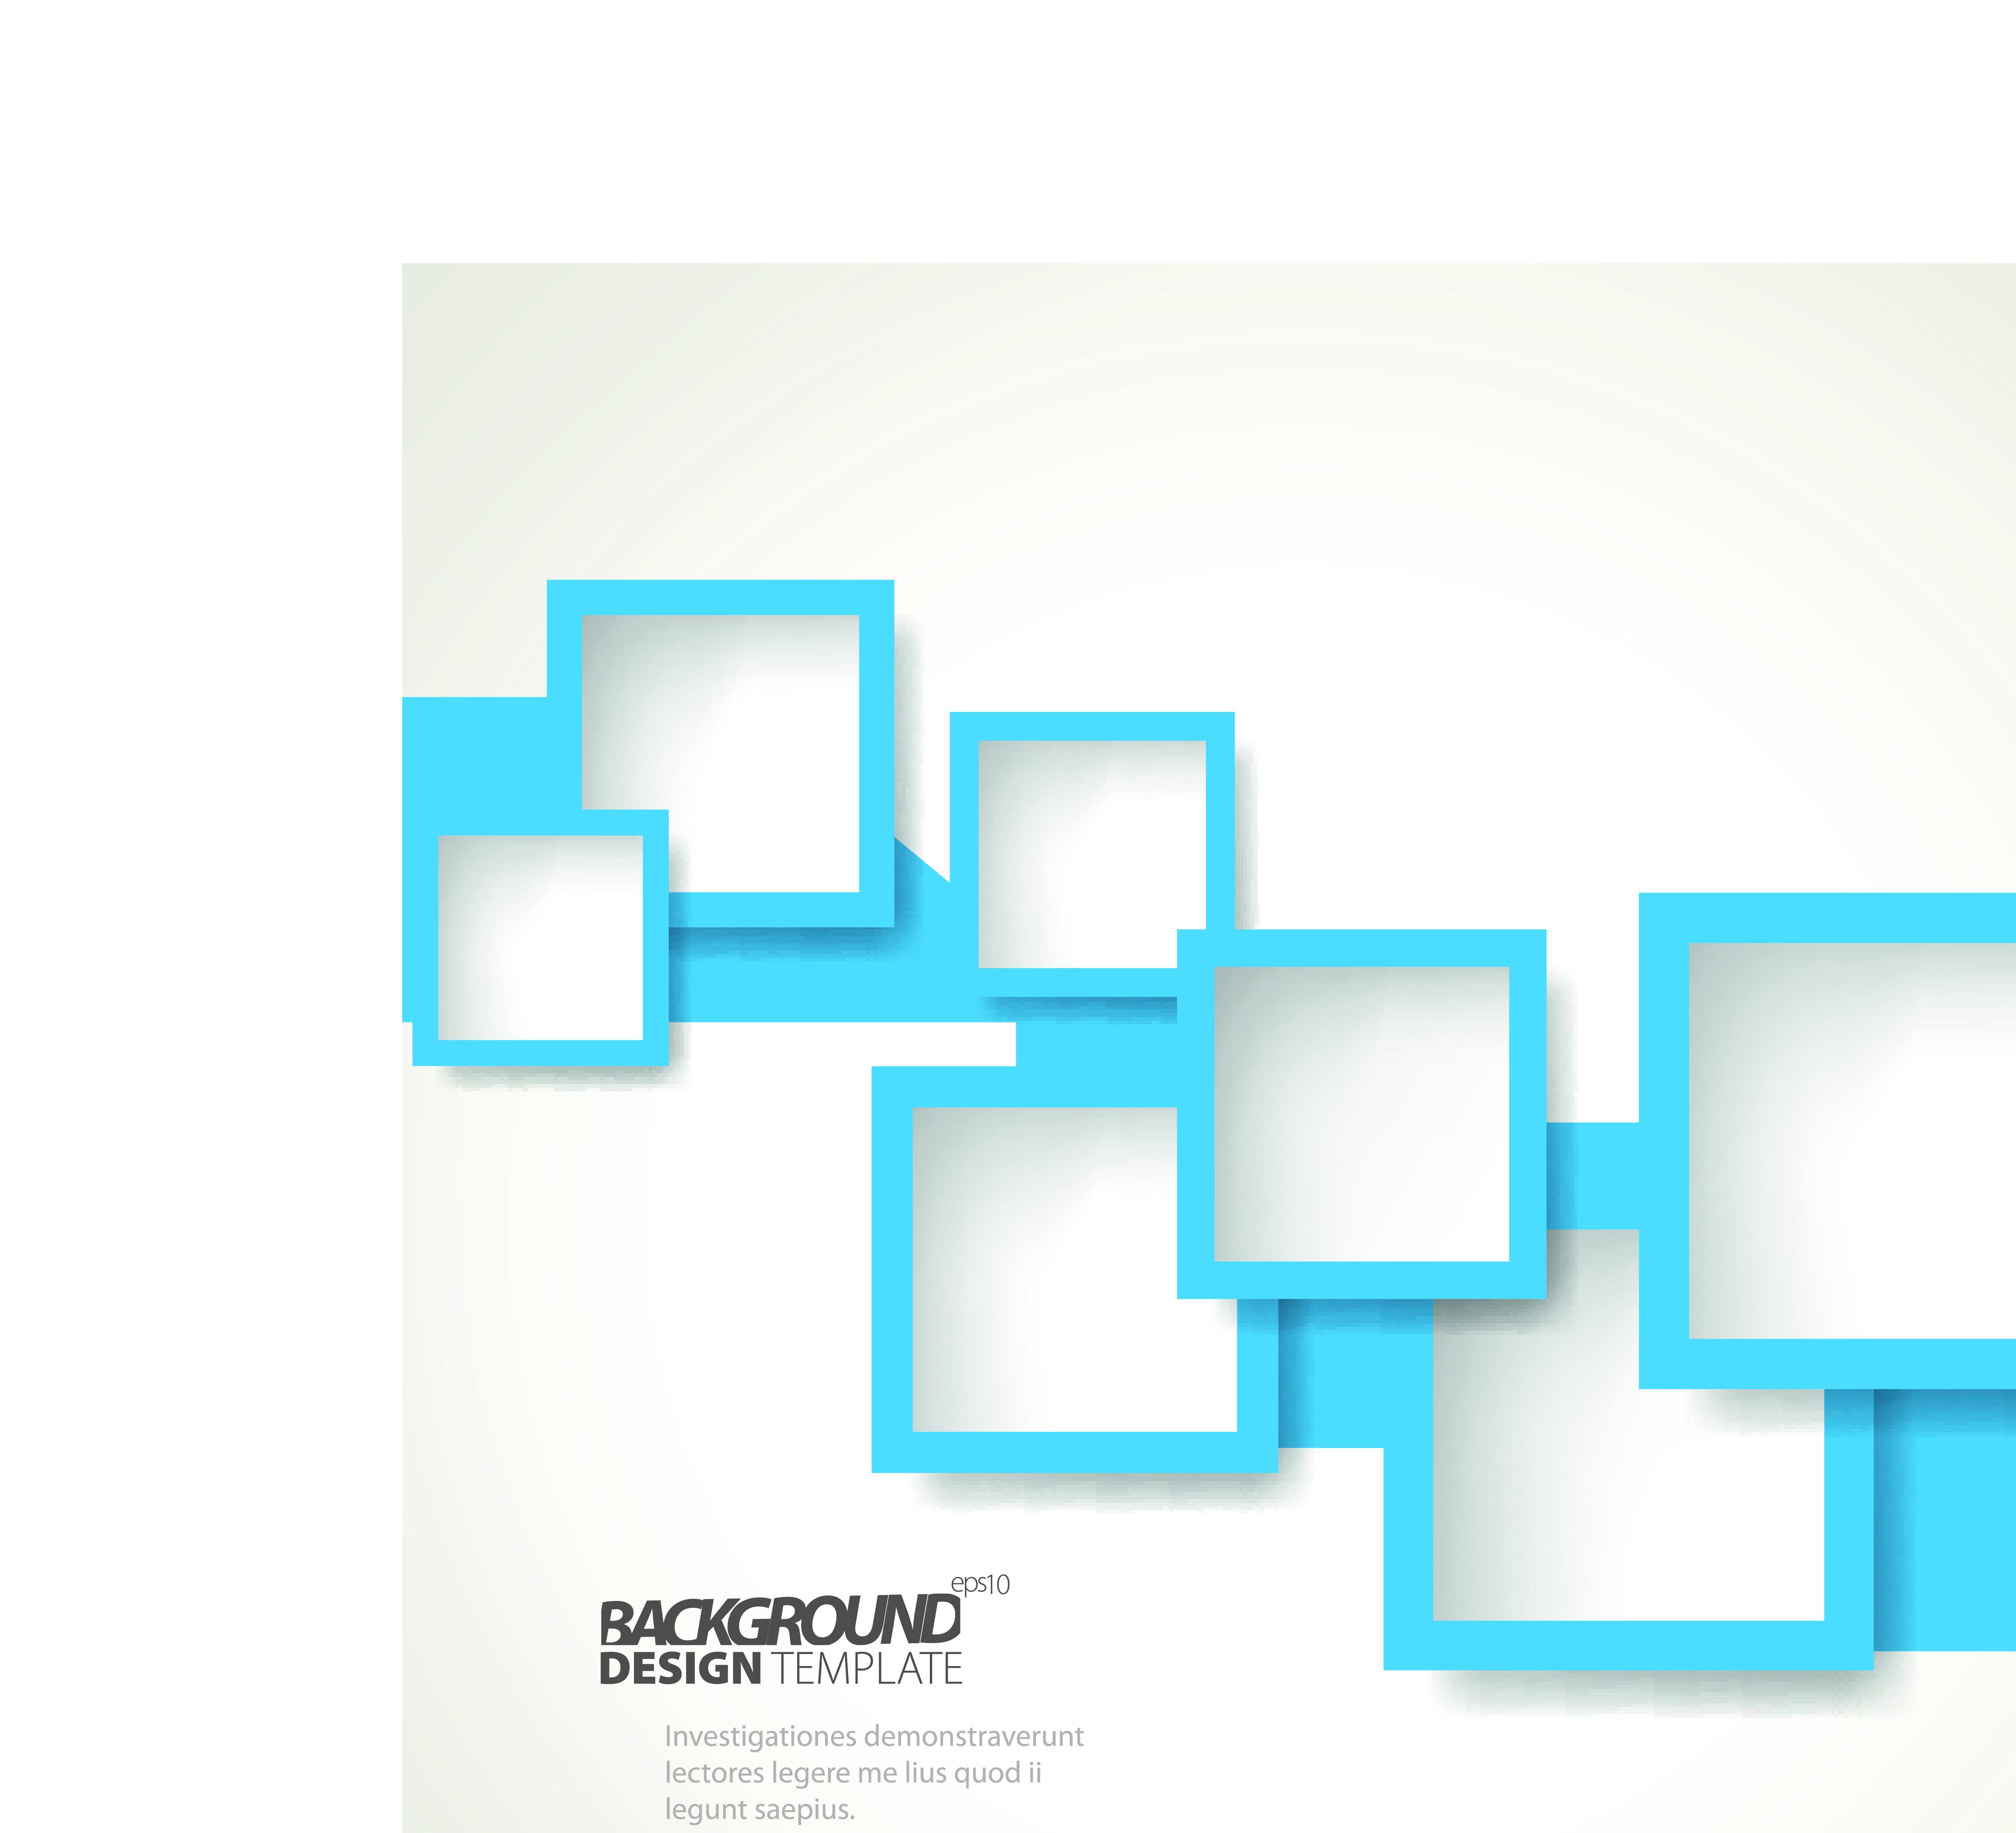 Creative abstract shapes